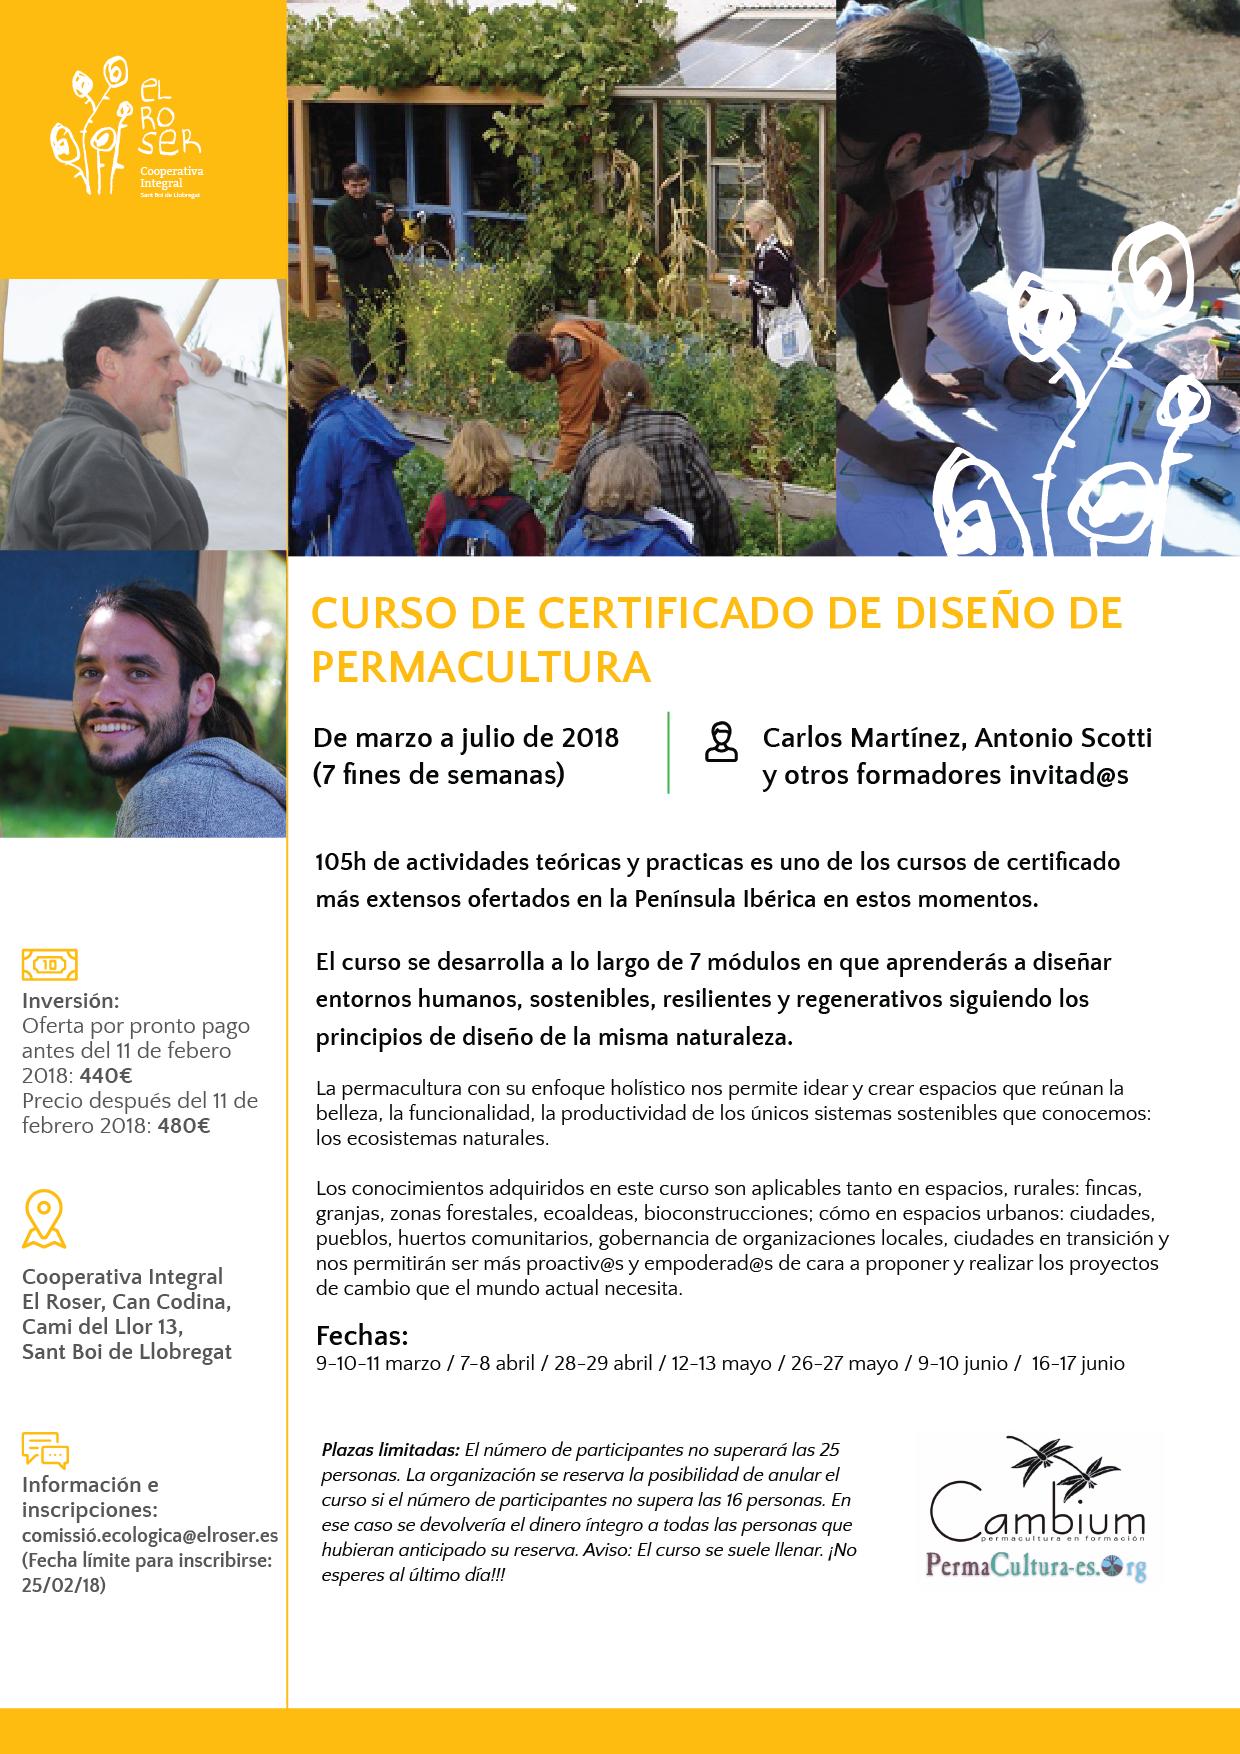 CURSO_Permacultura2017-18_PERMACULTURA